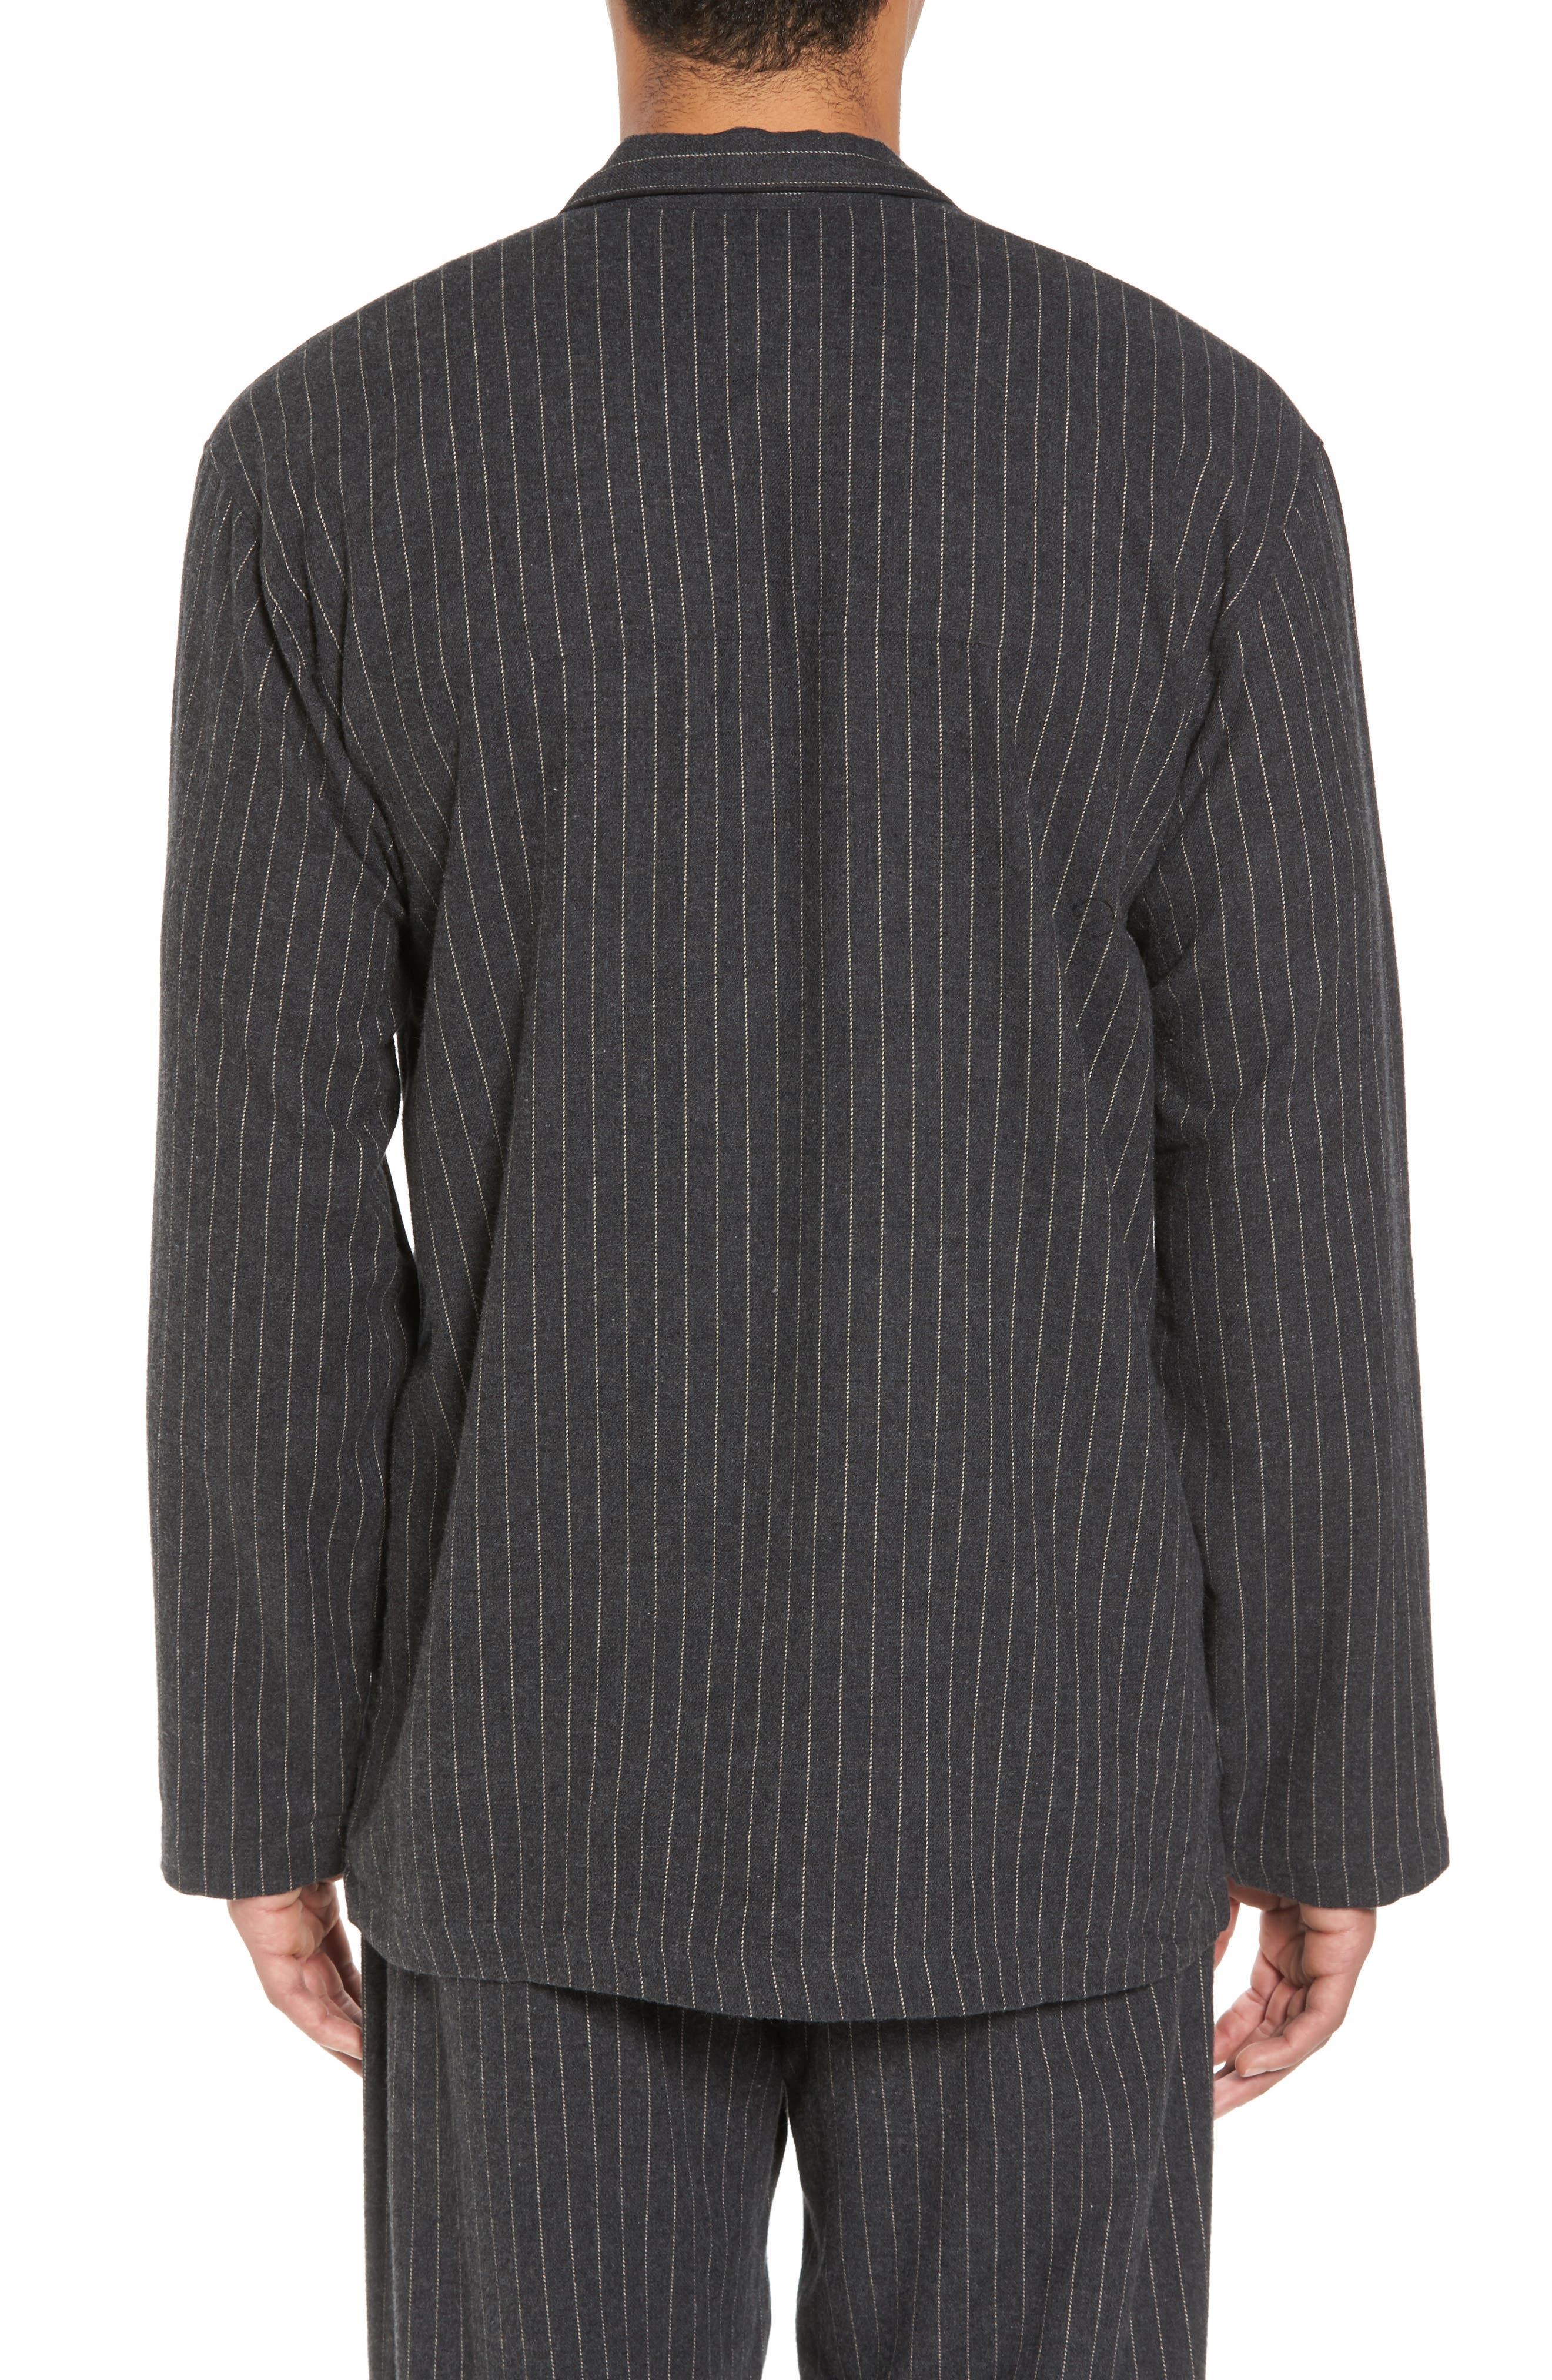 Polo Ralph Lauren Flannel Pajama Shirt,                             Alternate thumbnail 5, color,